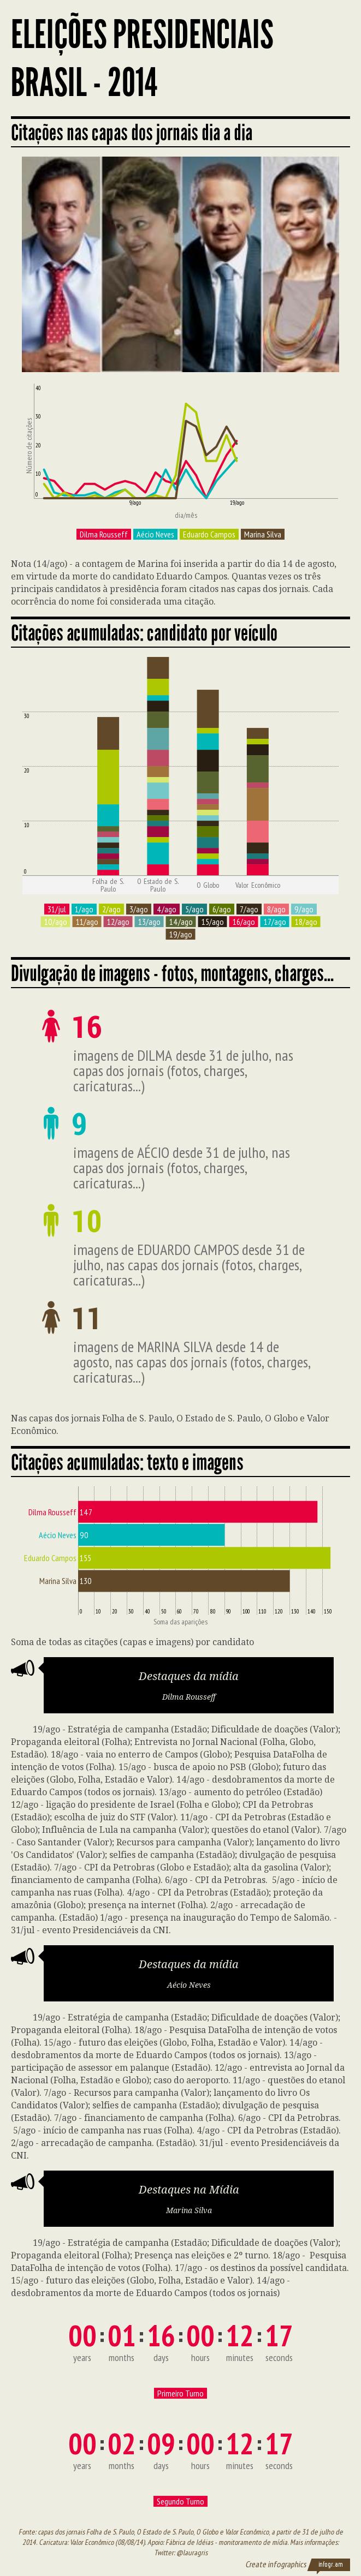 Eleicoes_Presidenciais_Brasil__2014 (2)